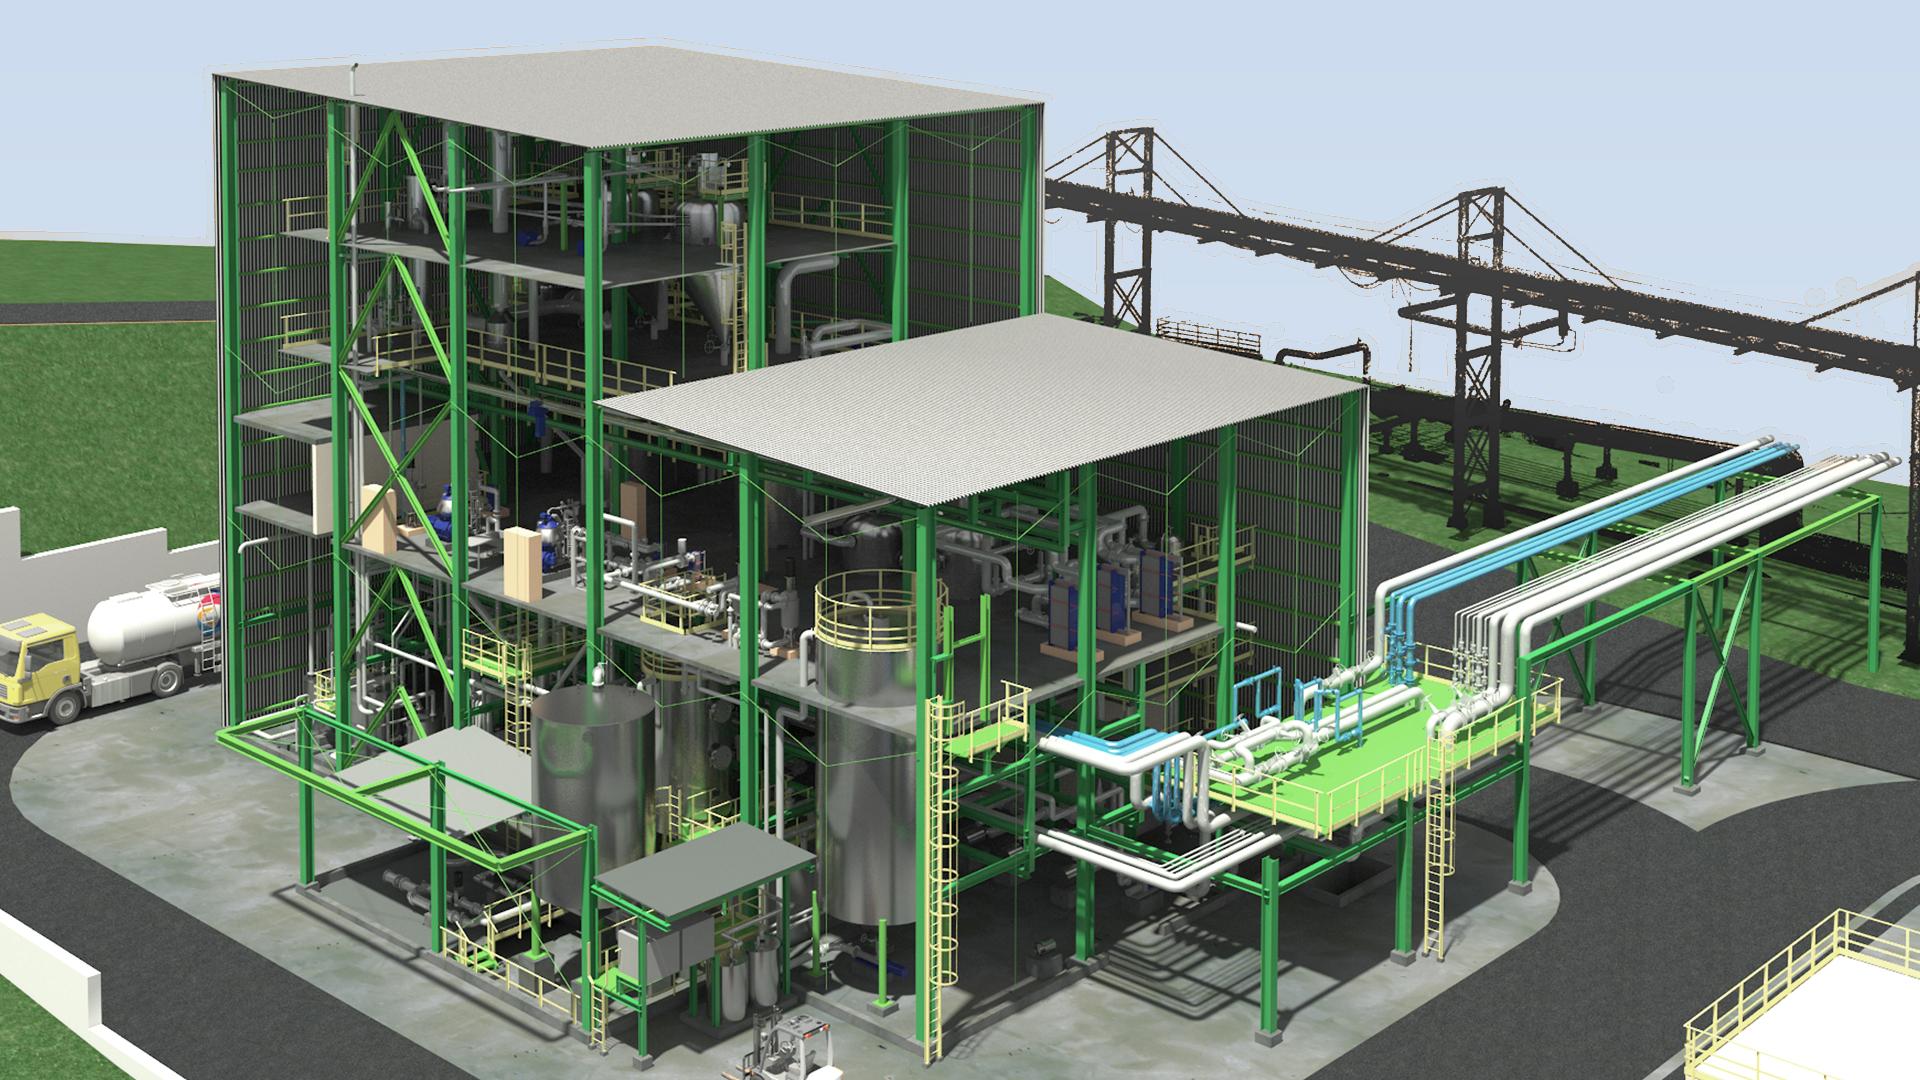 Render y Arquitectura 3D Industrial - GrupoAudiovisual 04